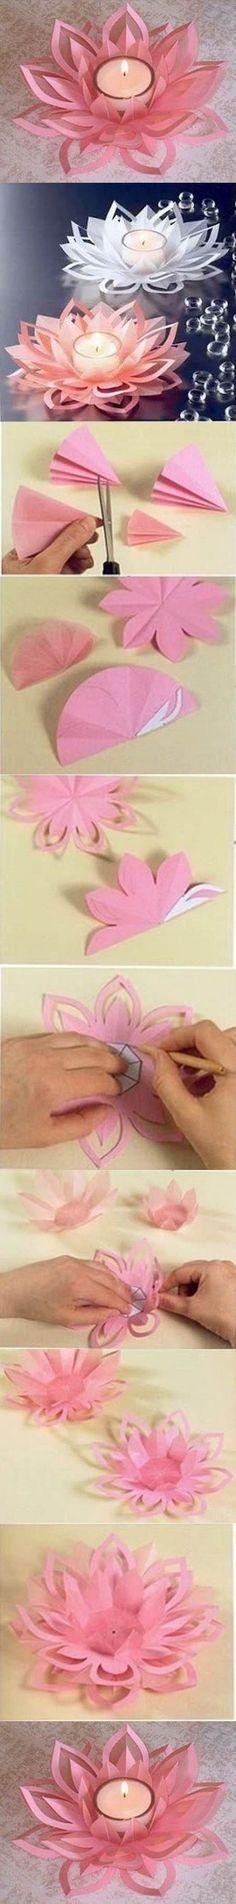 DIY Paper Lotus Candle Holders. More